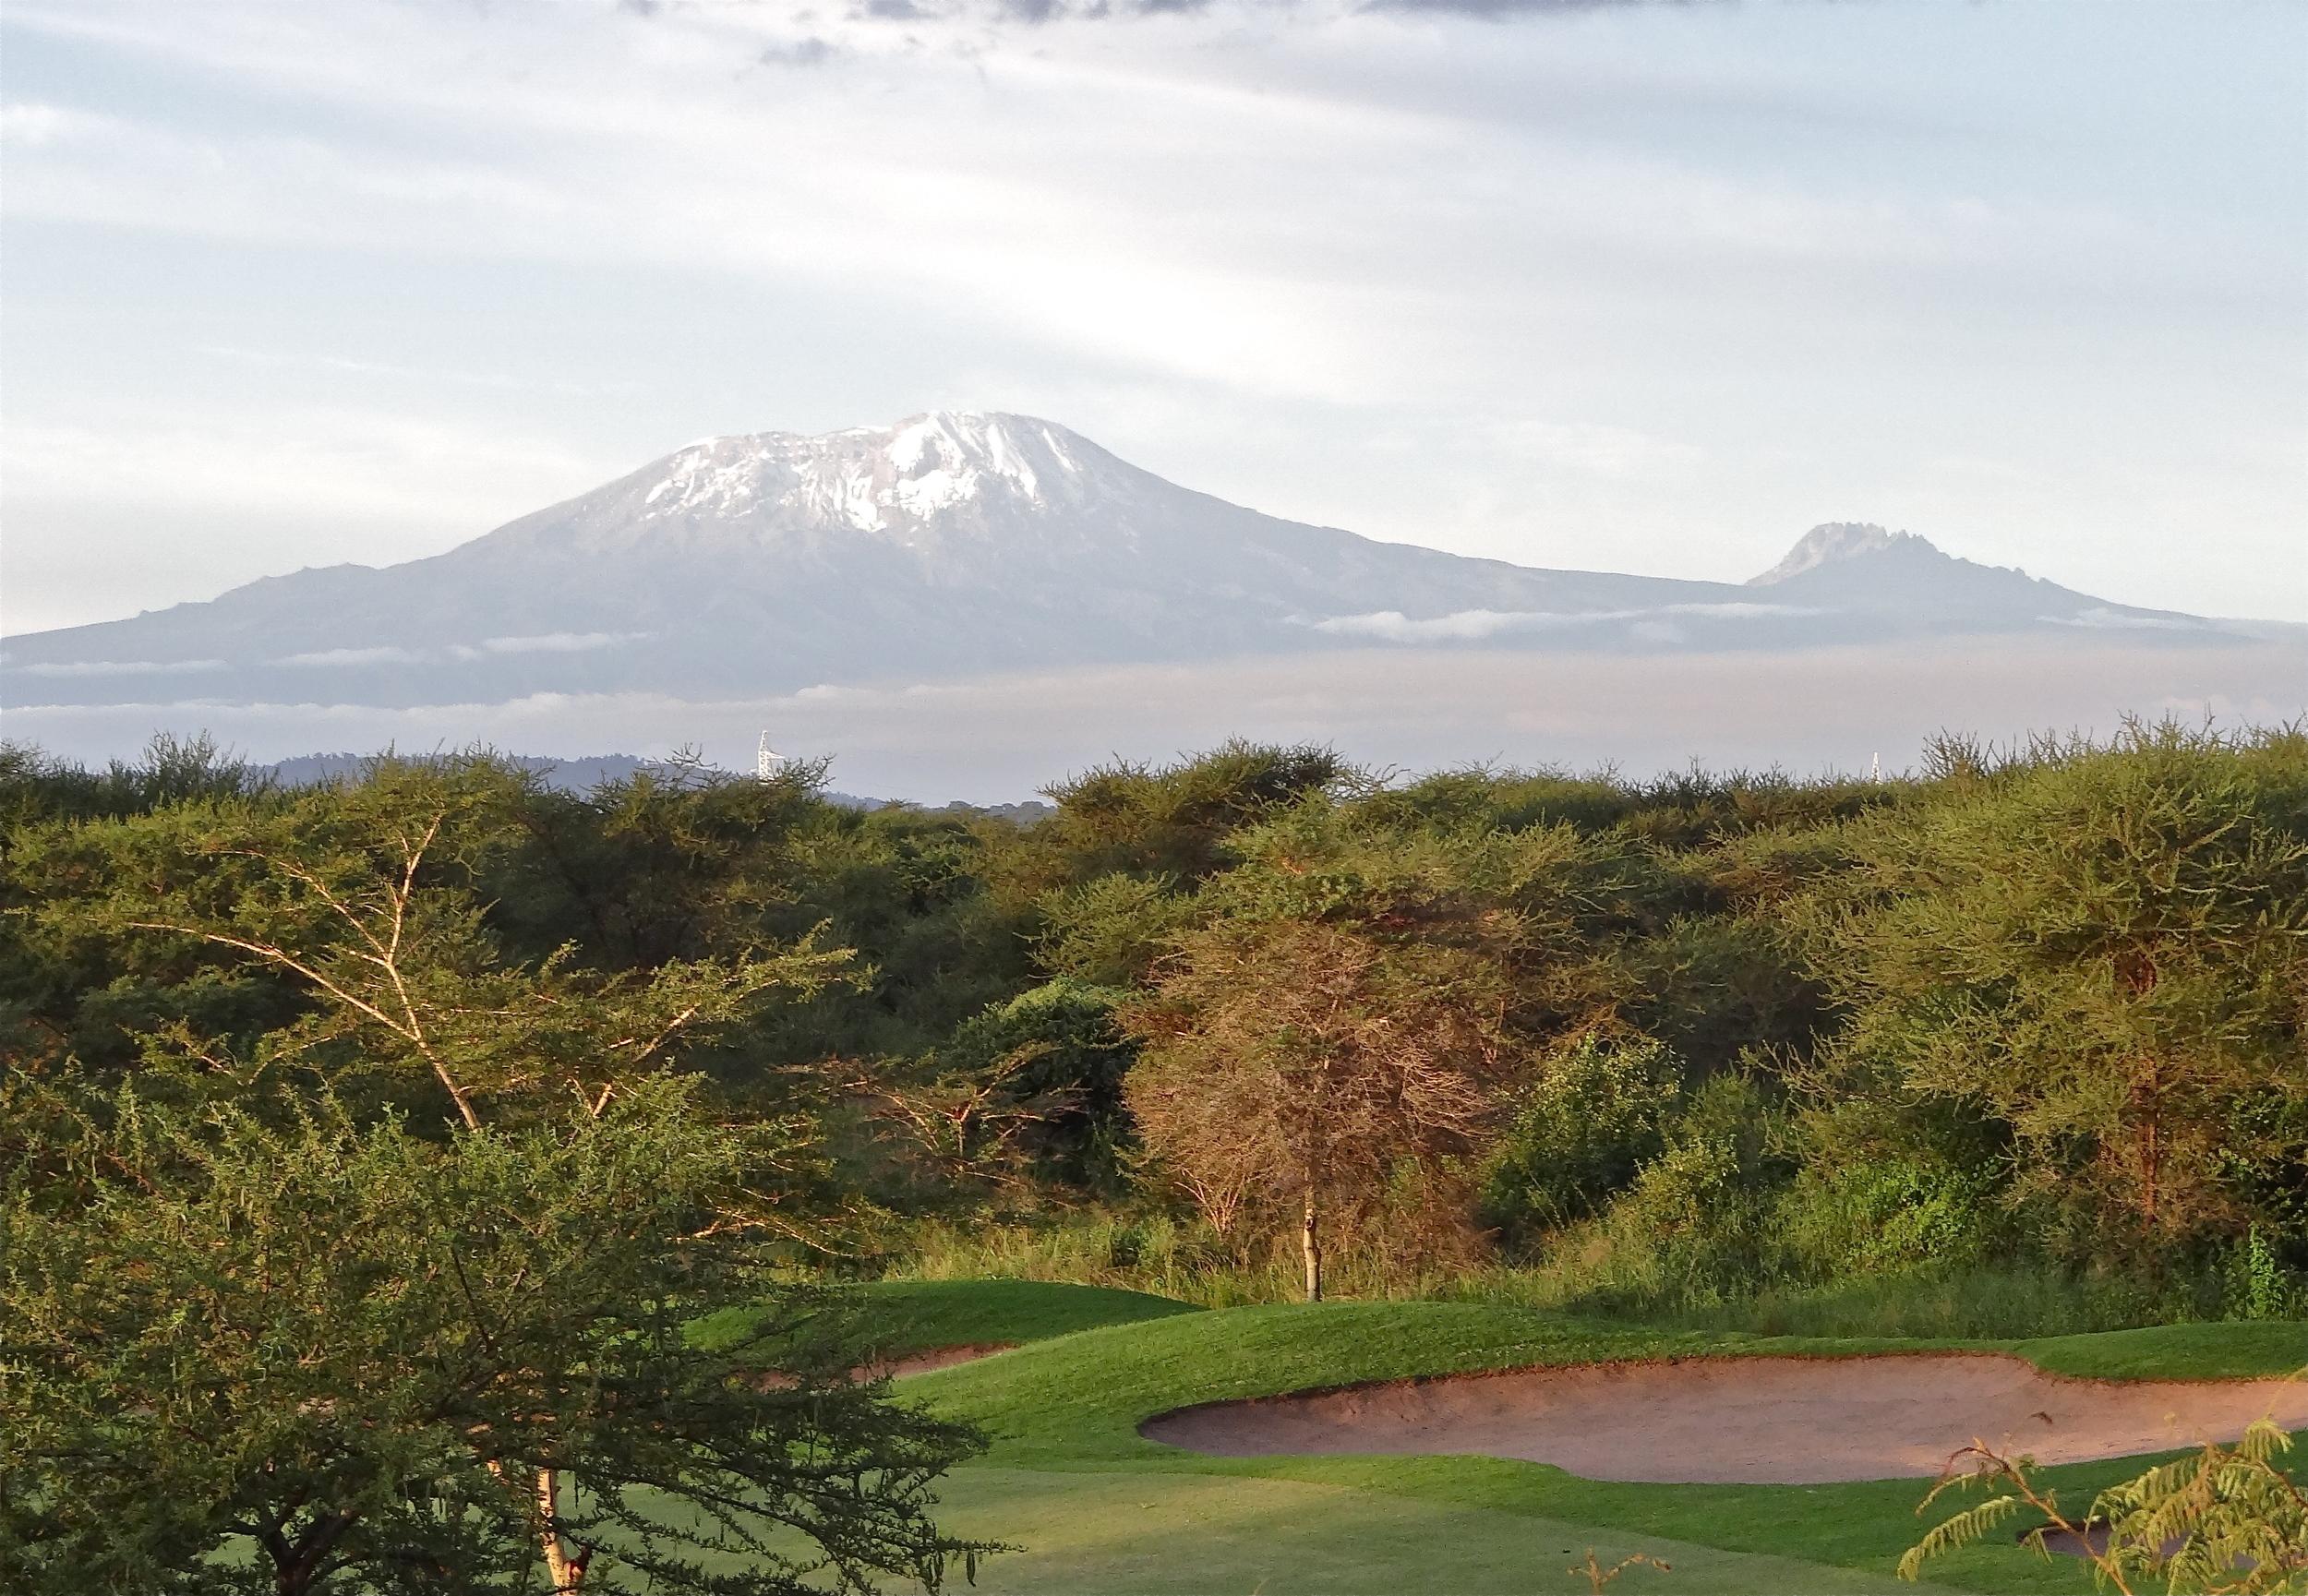 Kilimanjaro New_1.jpg